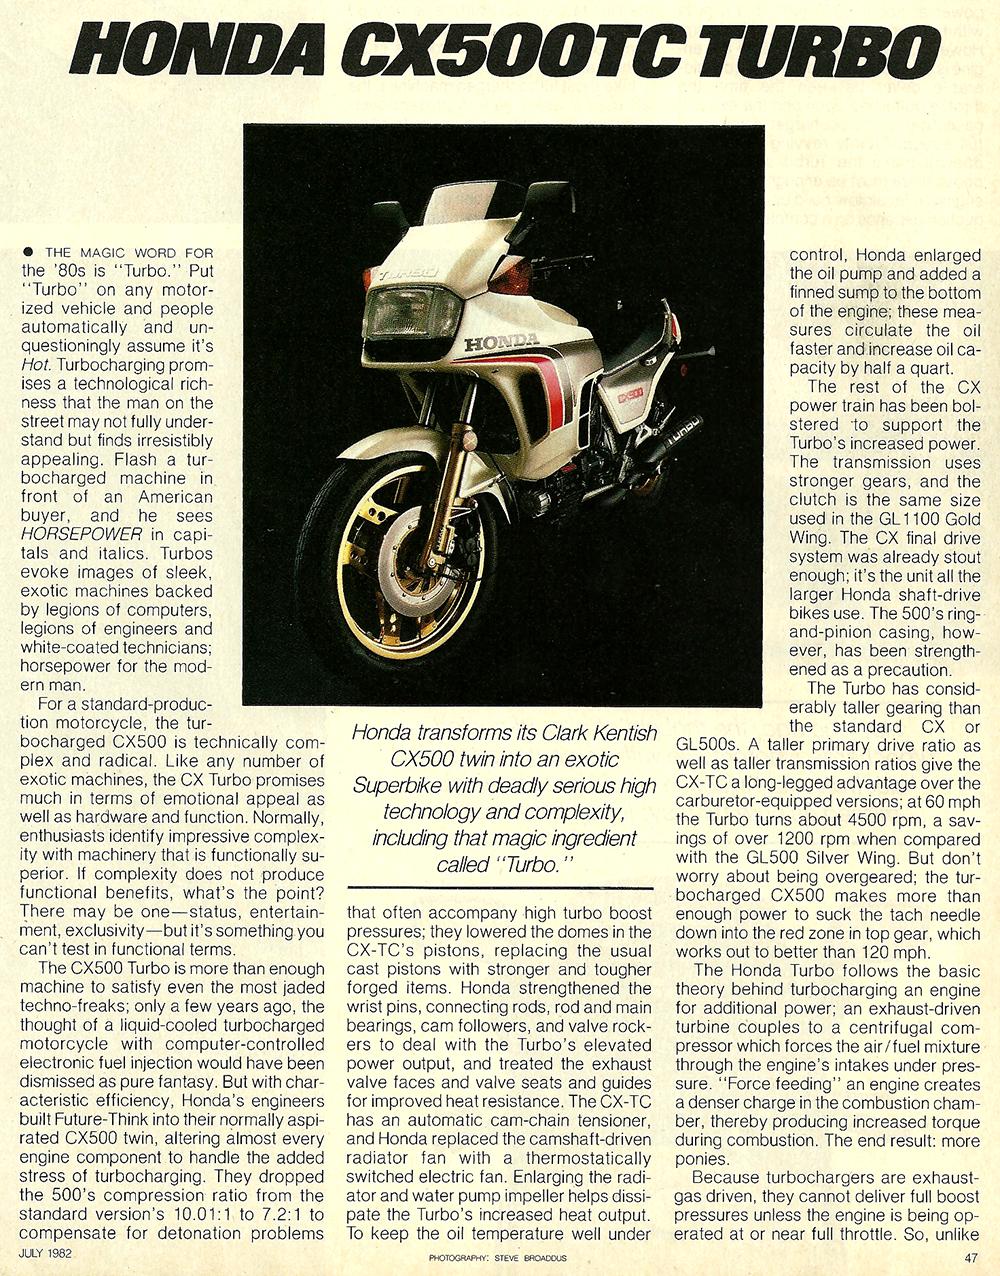 1982 Honda CX500TC Turbo road test 02.jpg